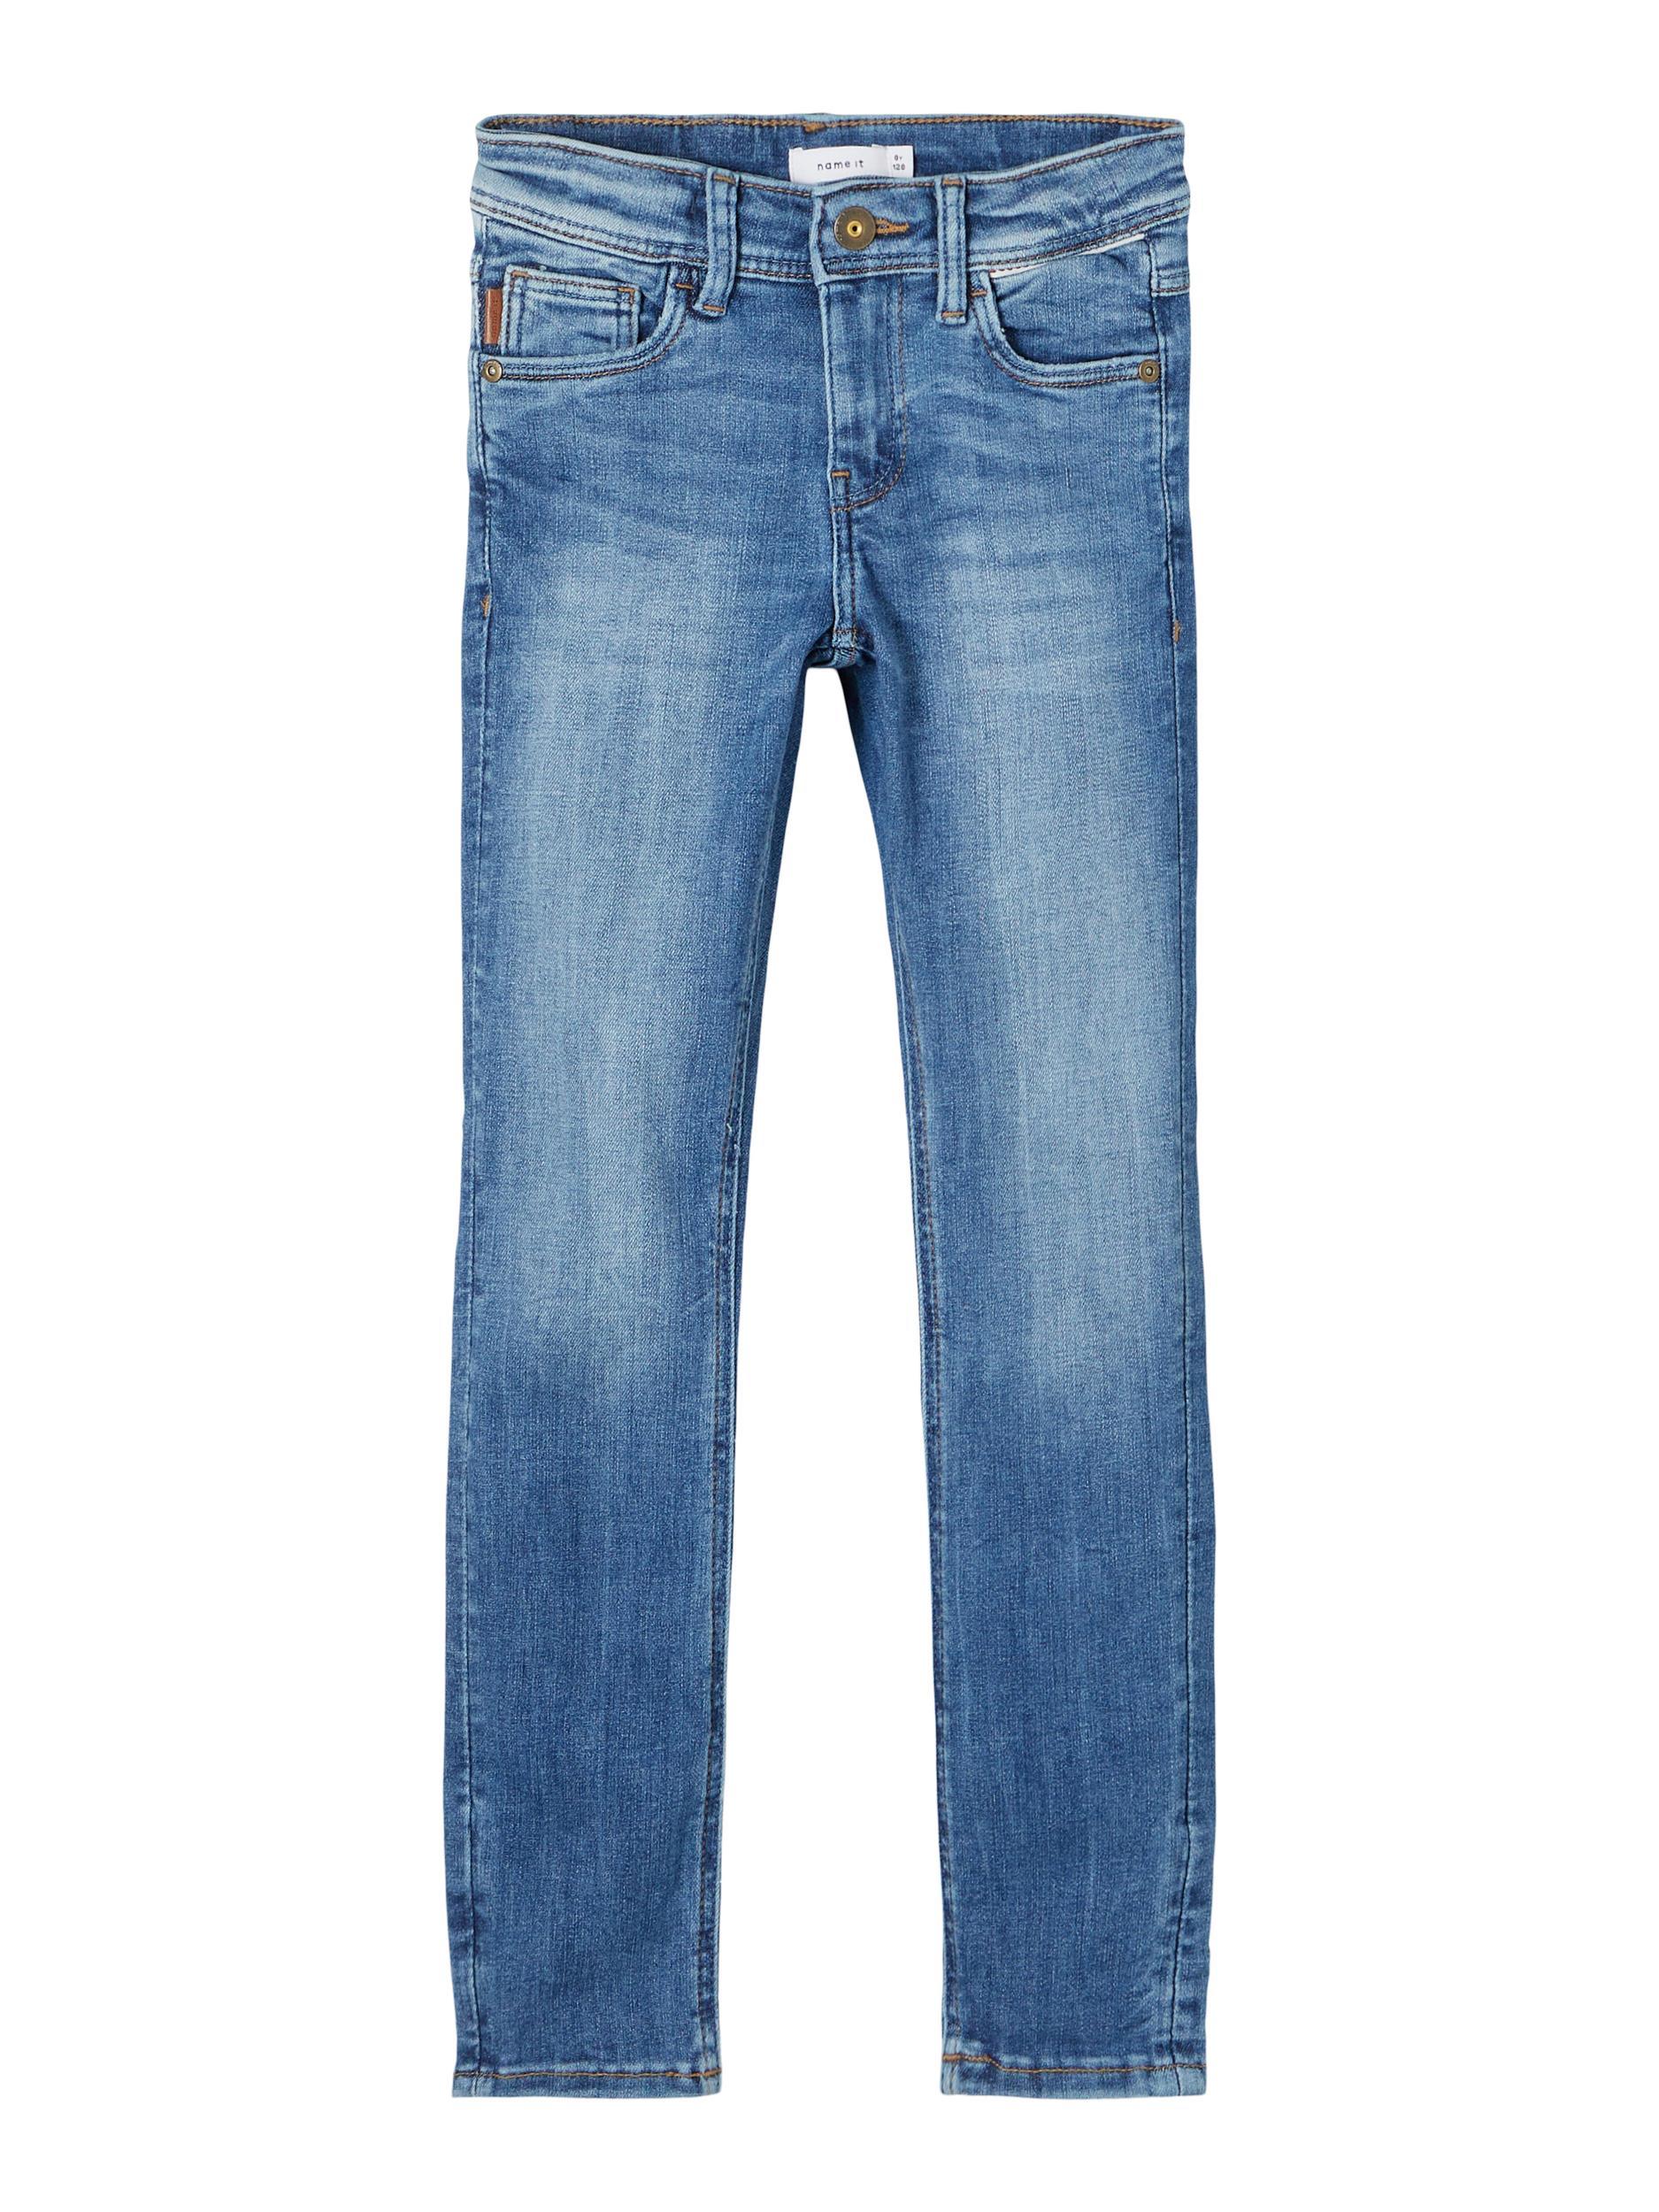 Name It Theo Tartys jeans, medium blue denim, 146